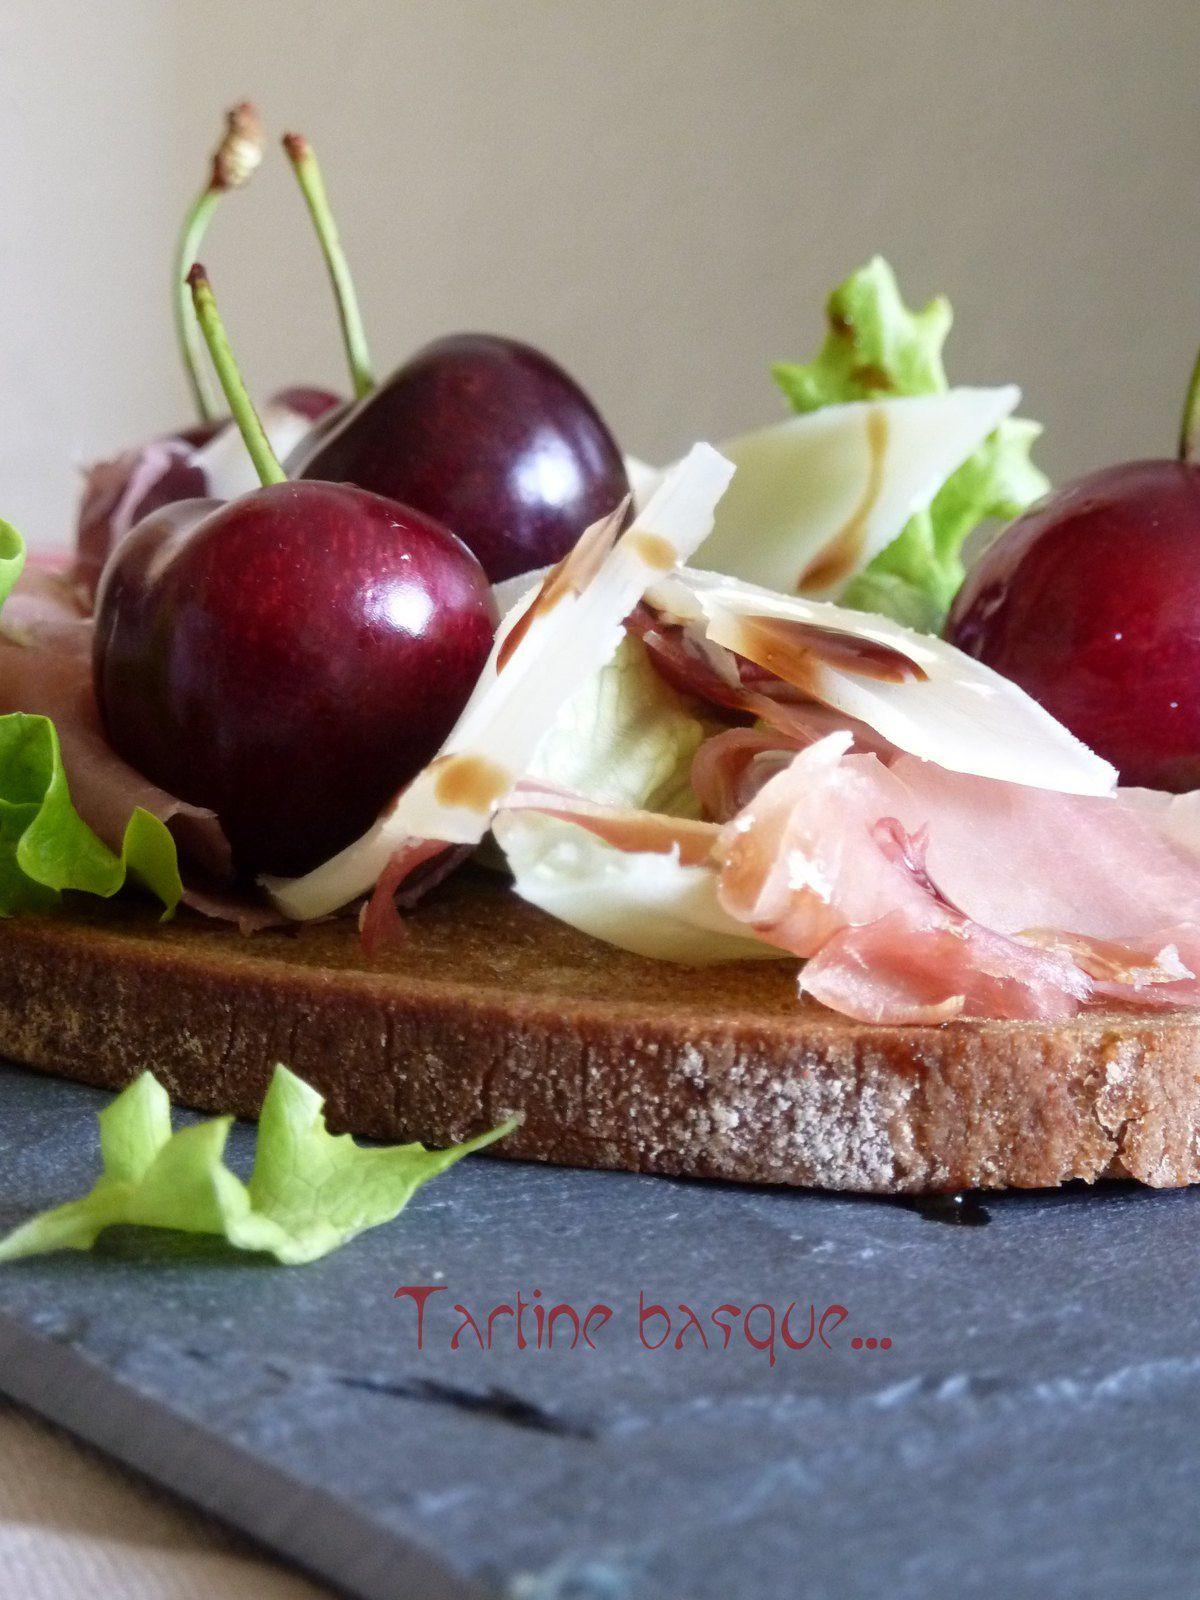 Tartine basque: ossau iraty, jambon de bayonne et cerises